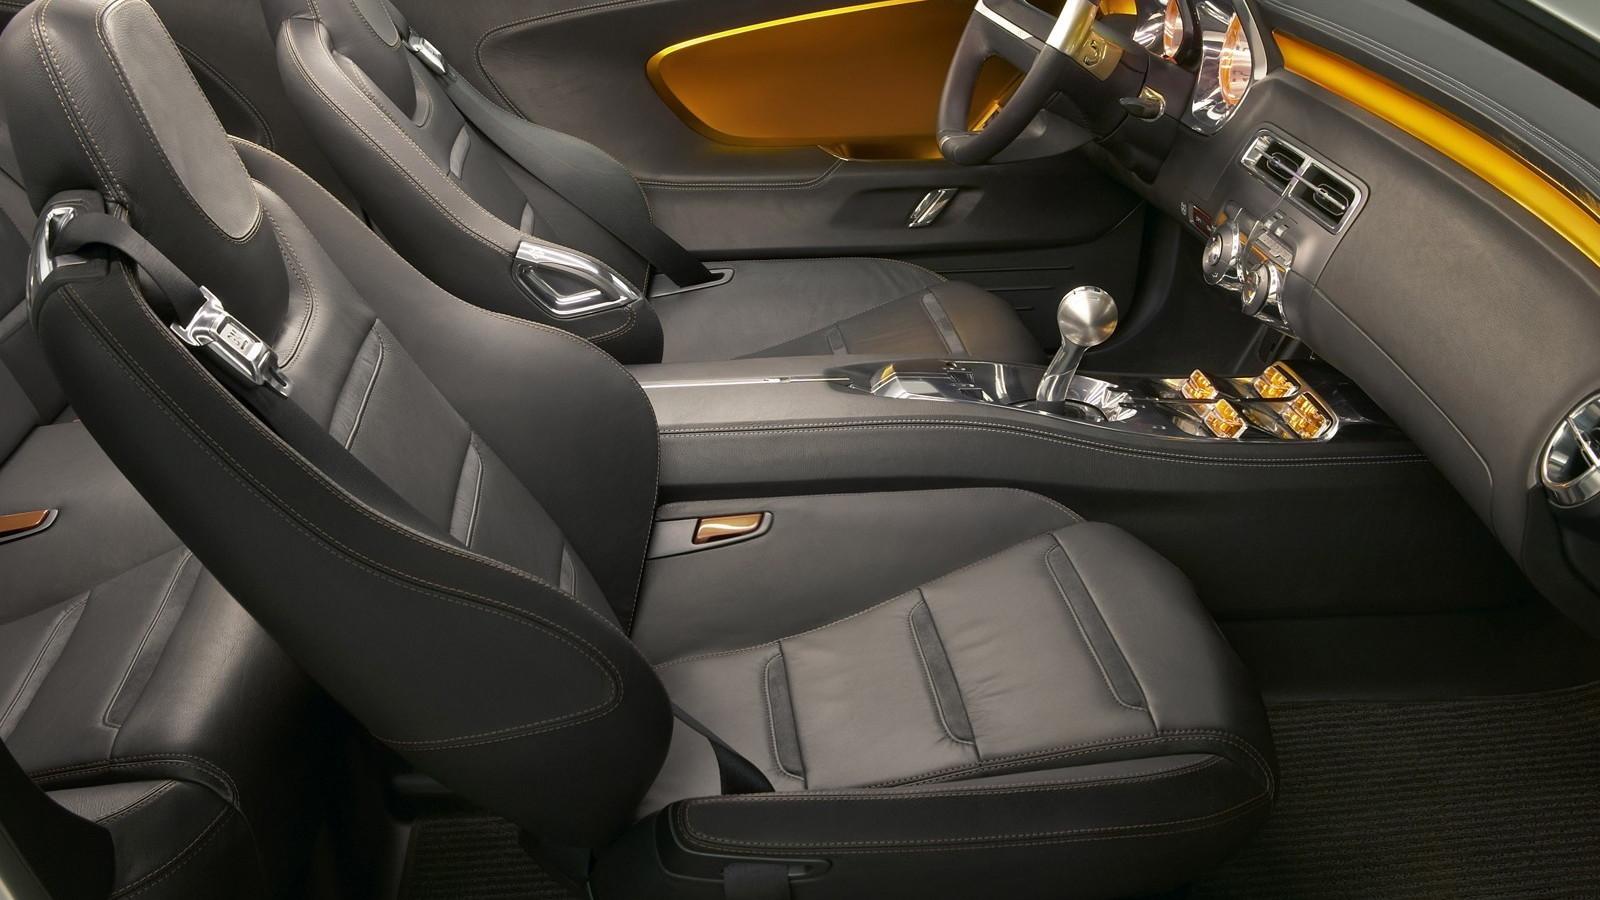 Chevrolet_Camaro_Concept_009.jpg